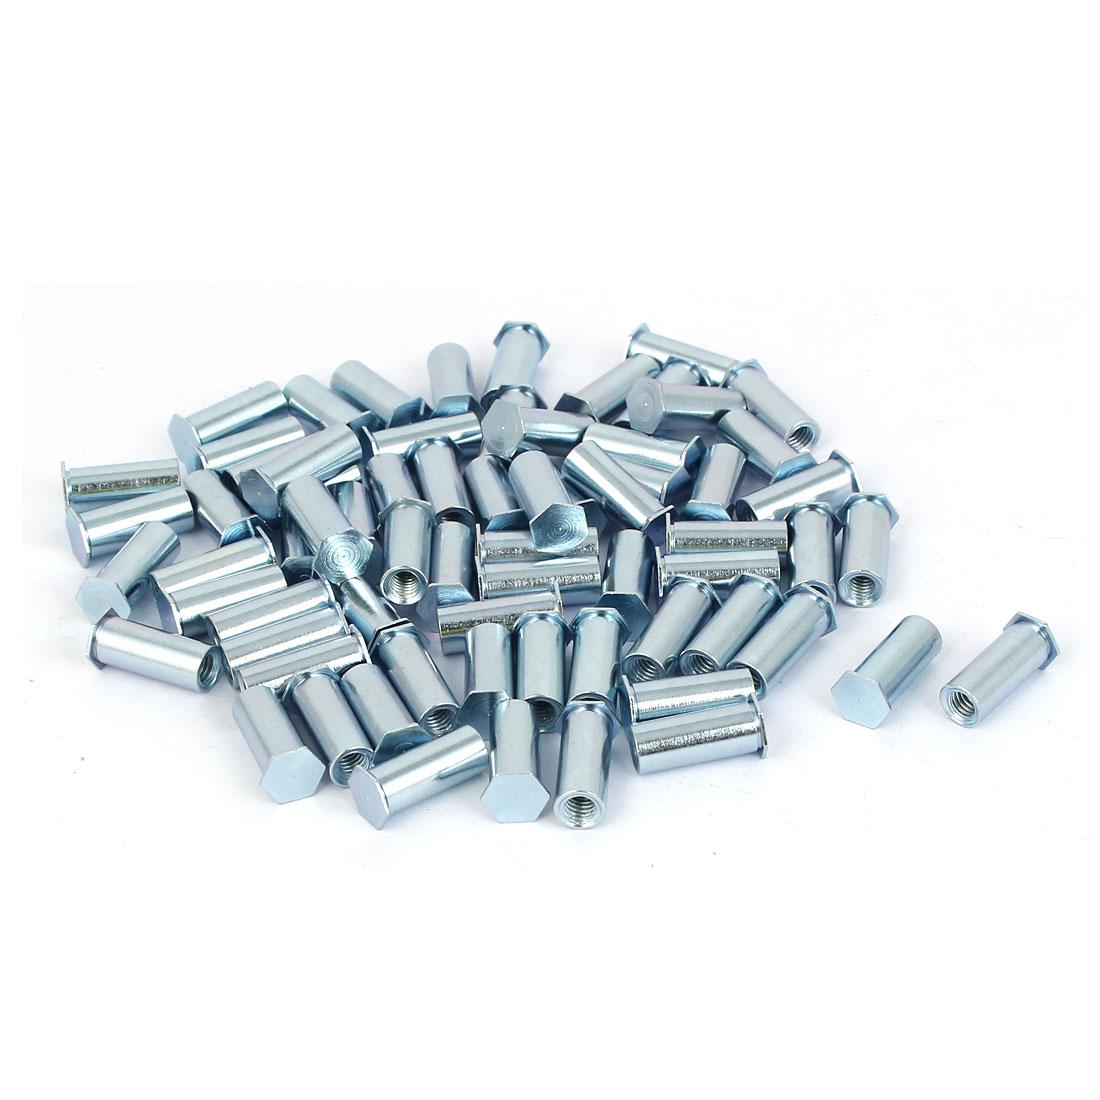 Carbon Steel Zinc Plated Hex Head Full Thread Self Clinching Standoff Silver Tone M4x15mm 50pcs